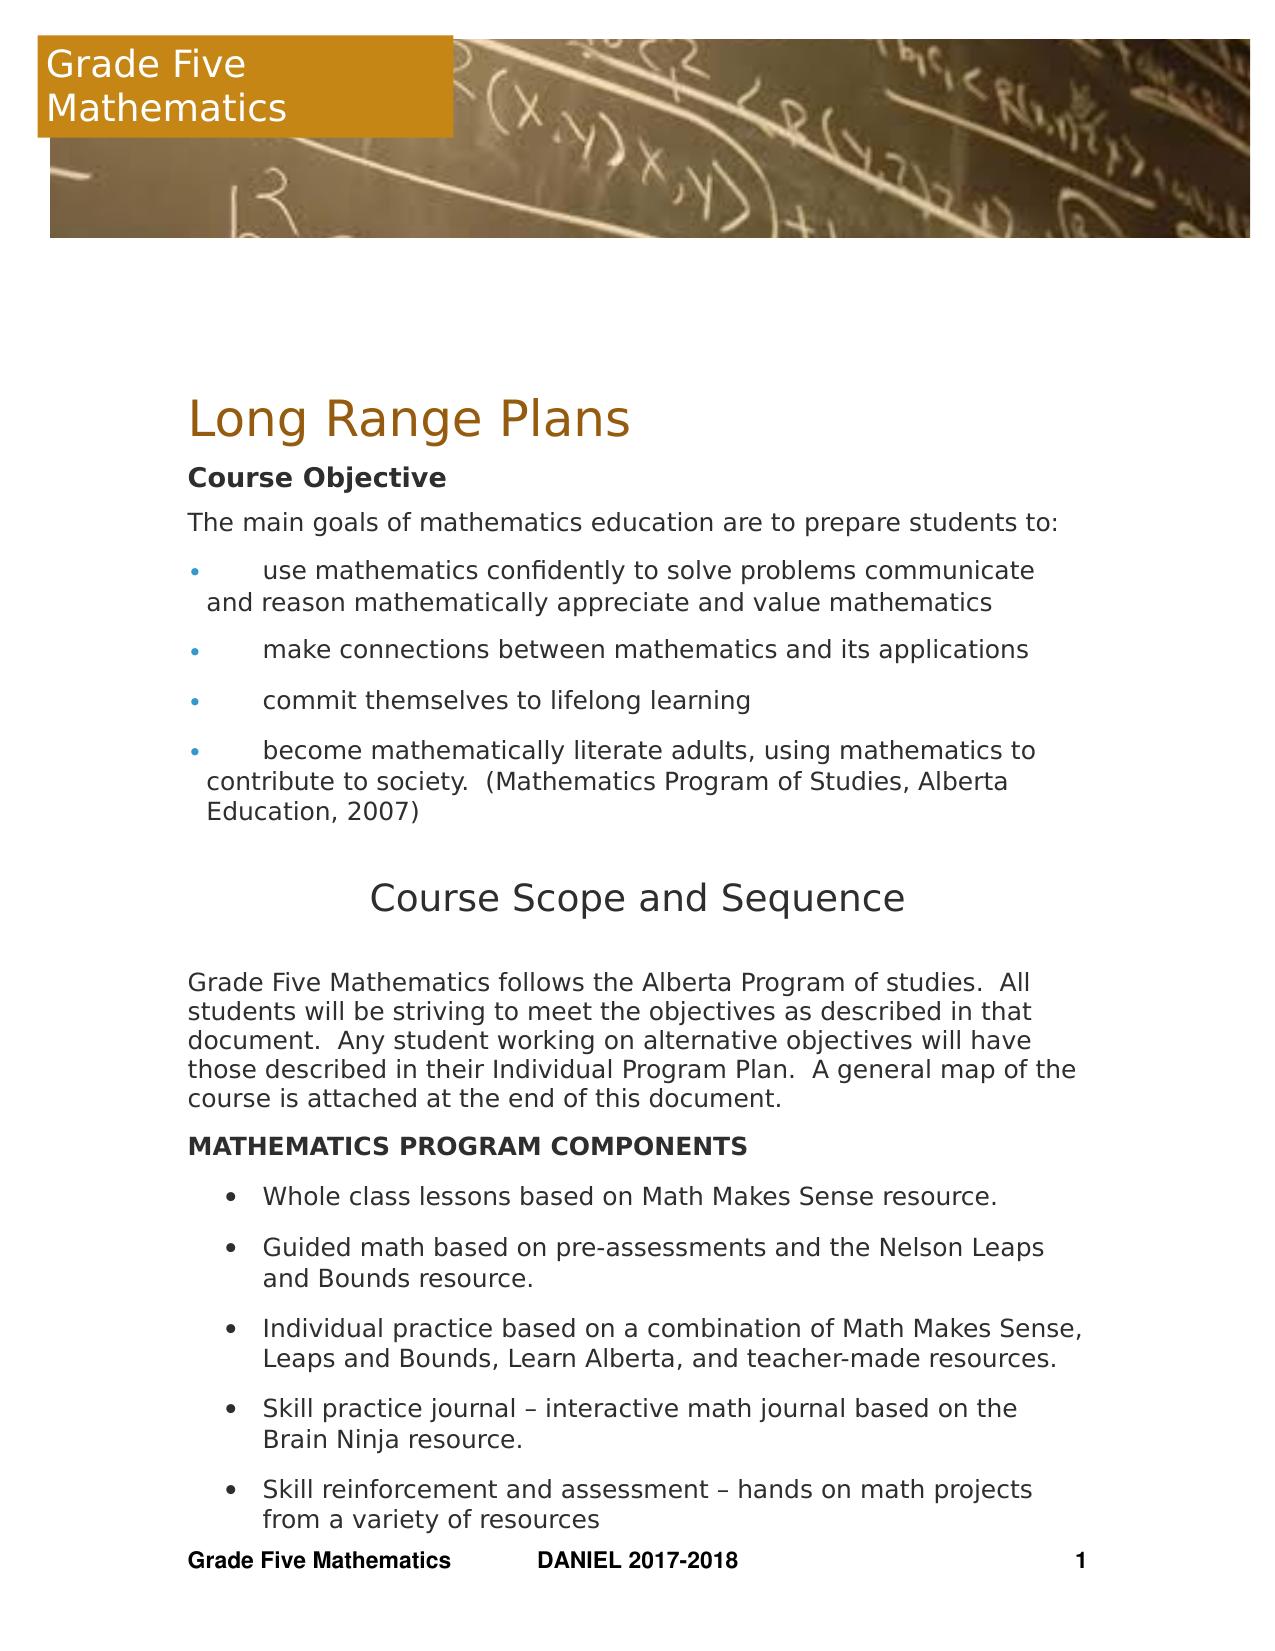 Math 5 Long Range Plan Resource Preview